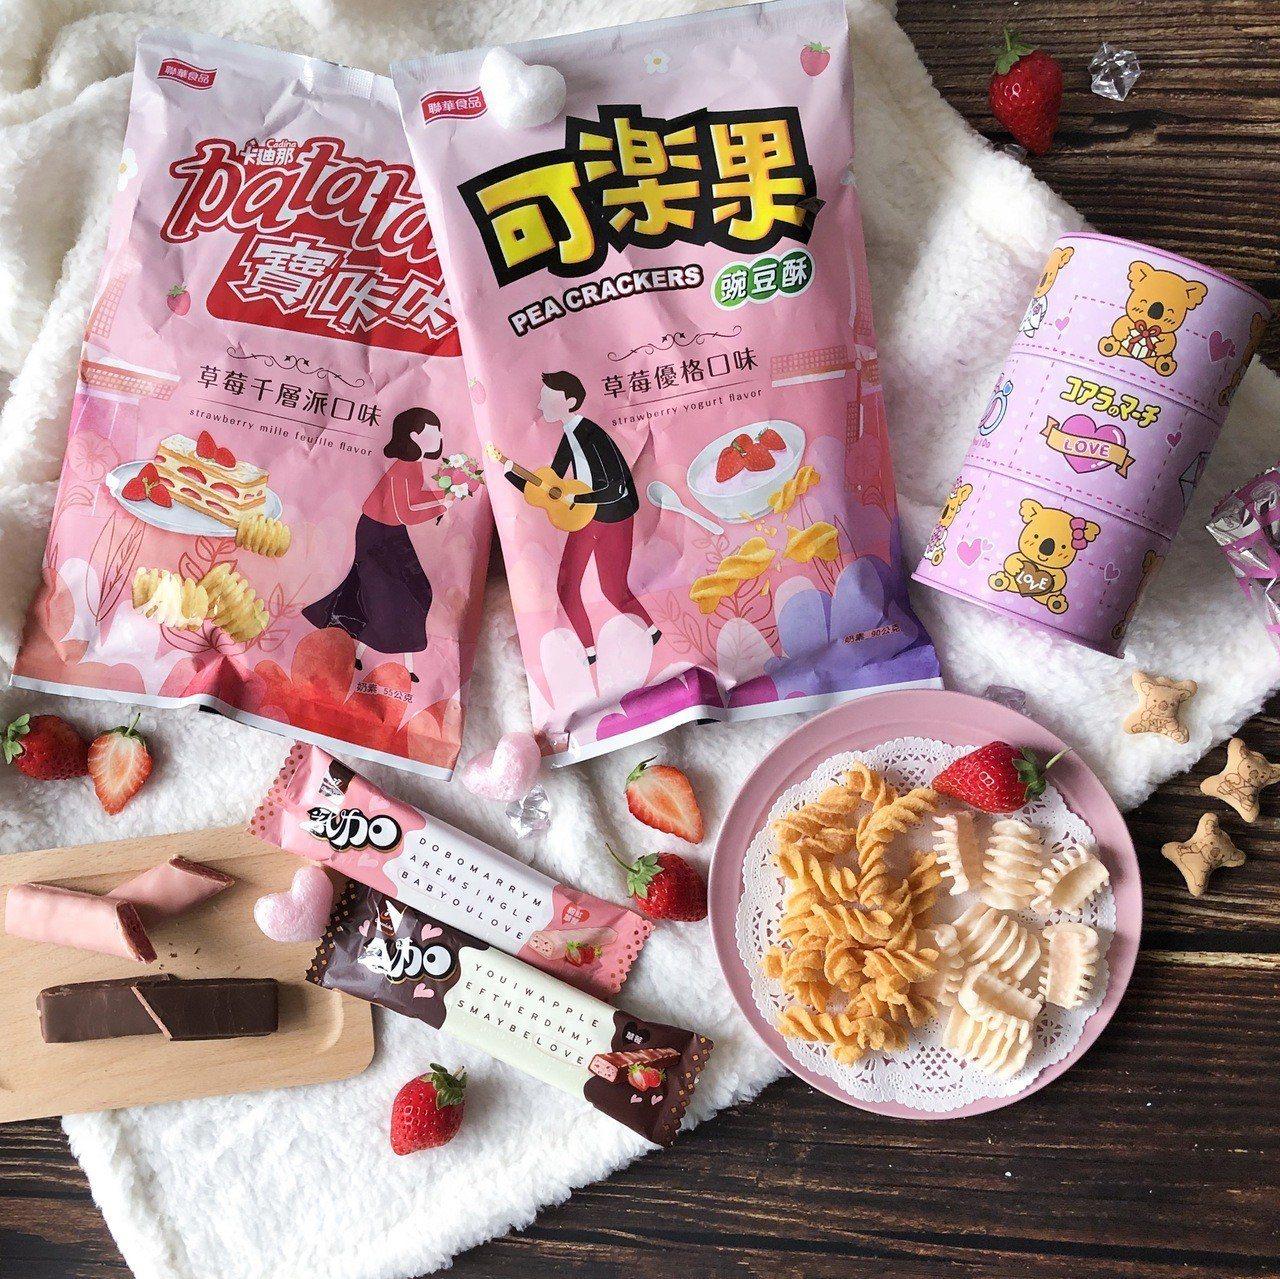 7-ELEVEN愛戀草莓季彙集糖果、巧克力、餅乾、甜點、飲料、啤酒、冰品、CIT...